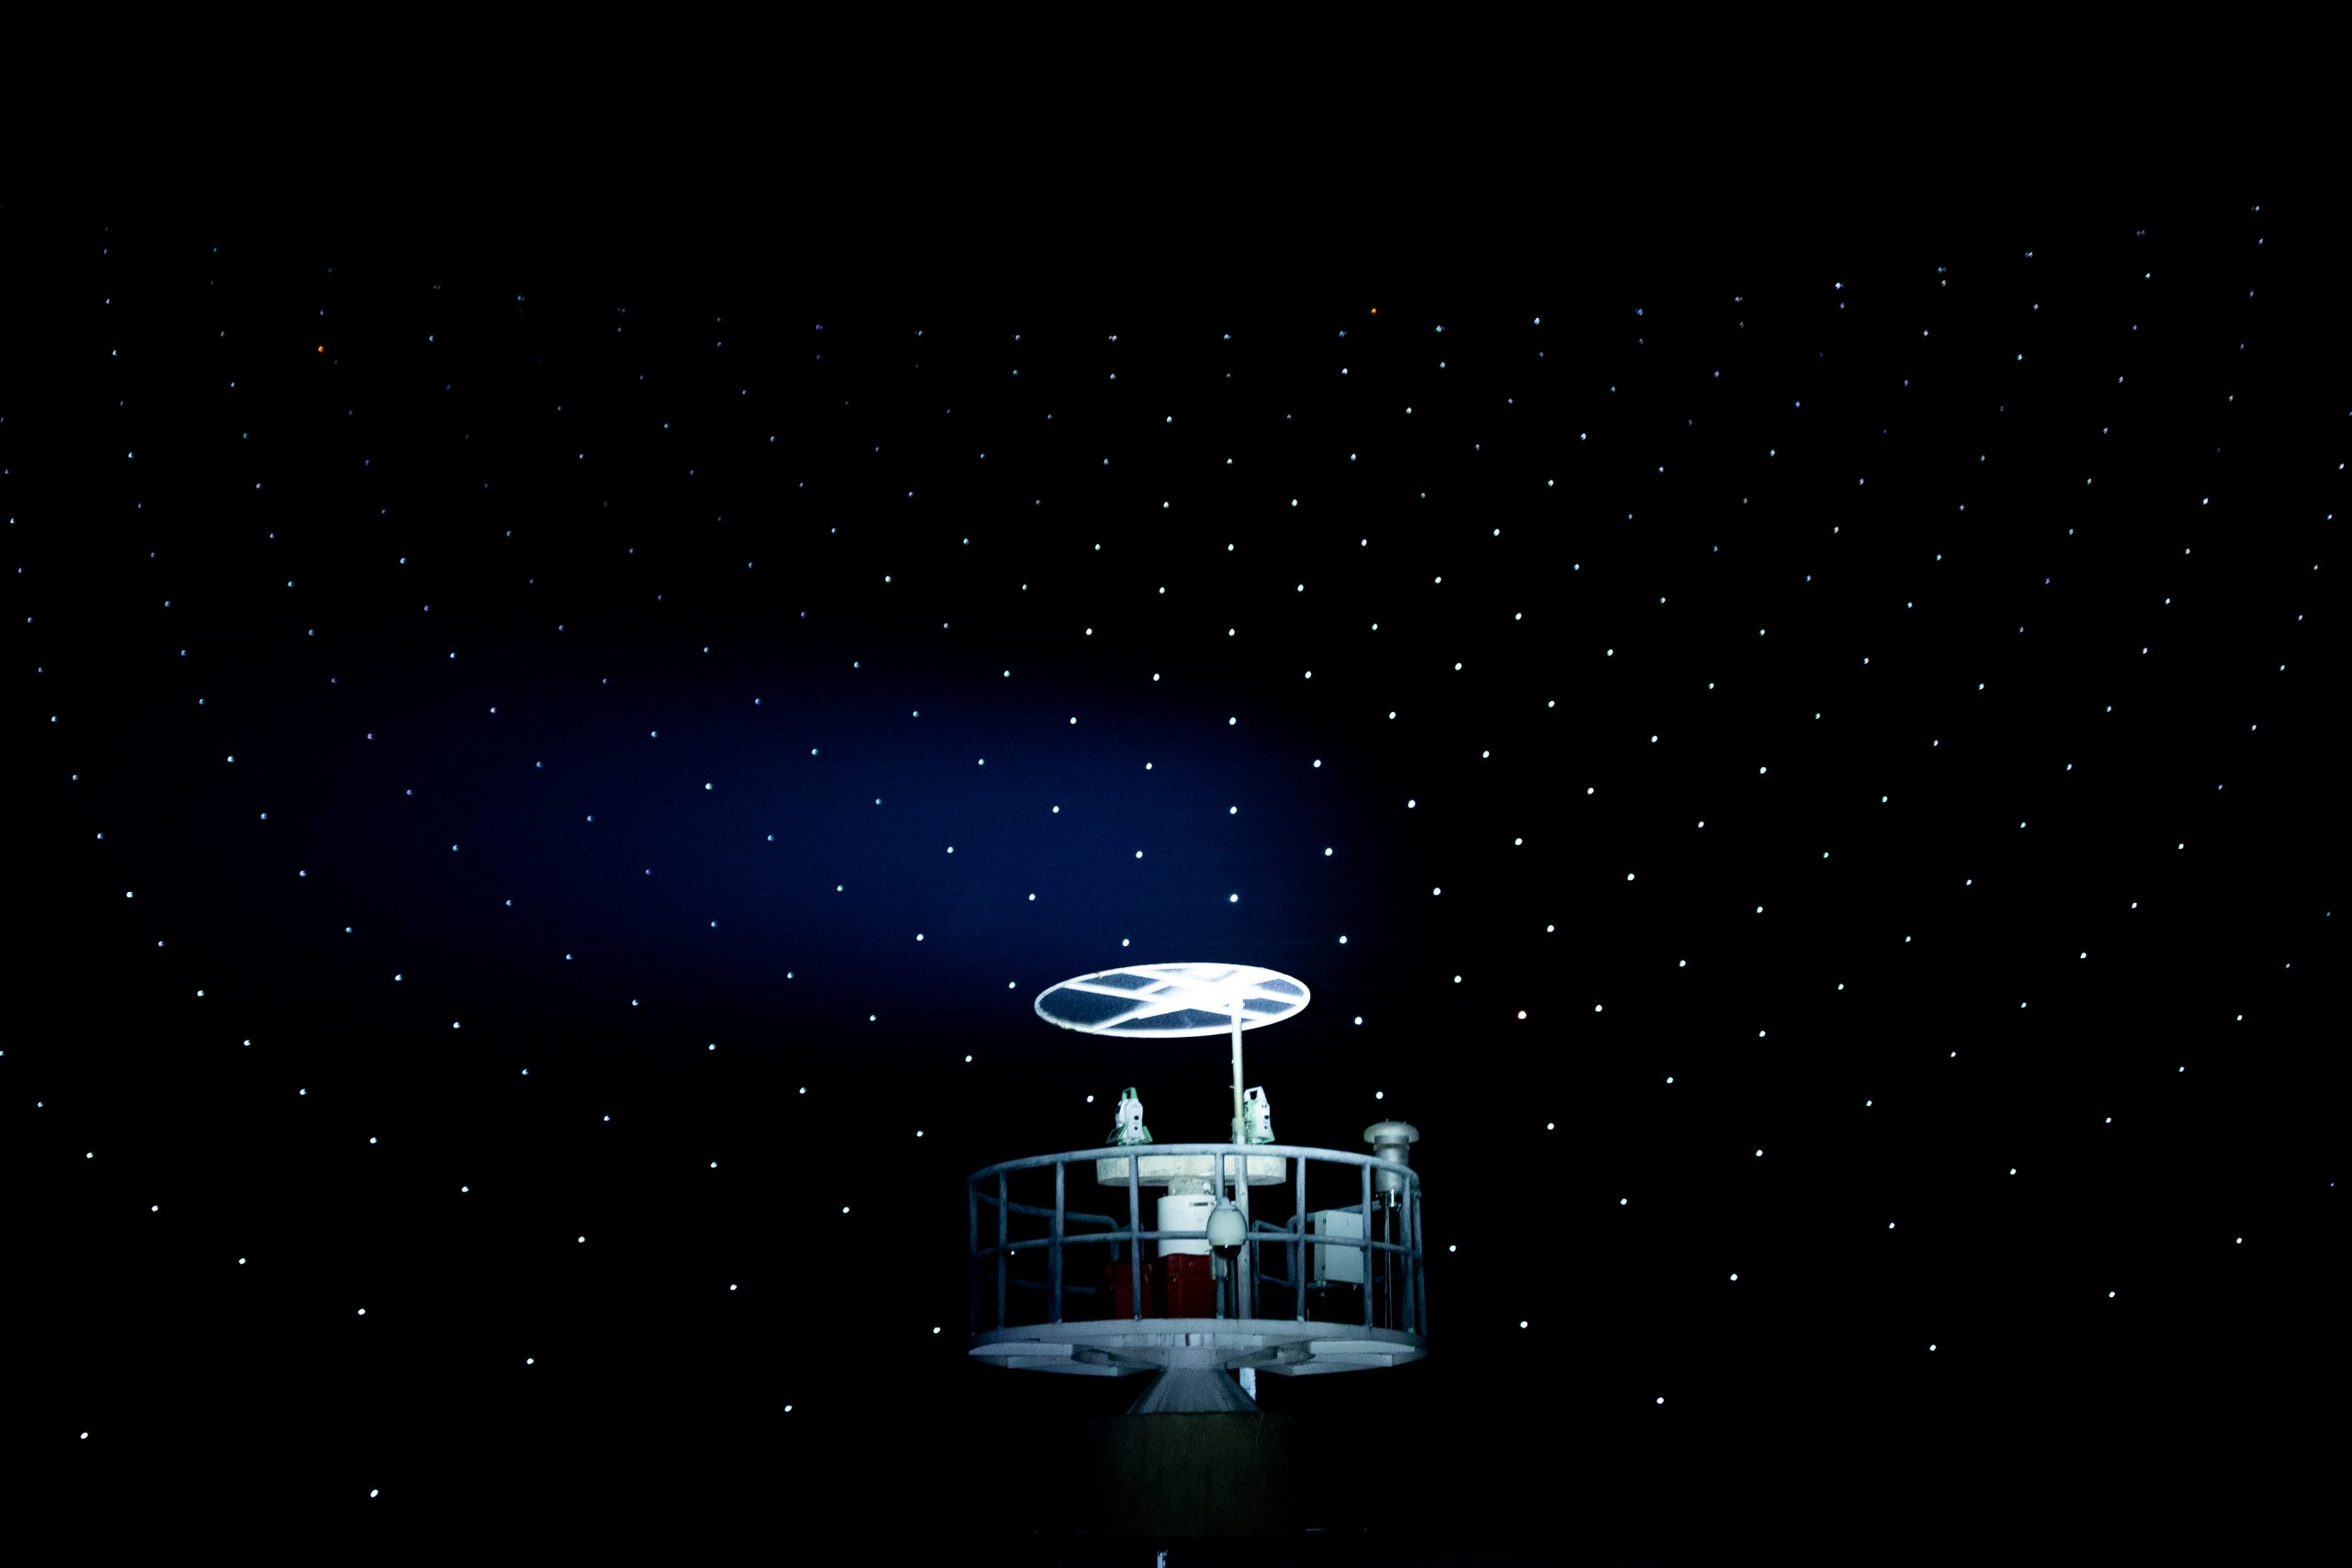 (EyesonSci)CHINA-GUIZHOU-FAST-GLOBAL ASTRONOMERS(CN)